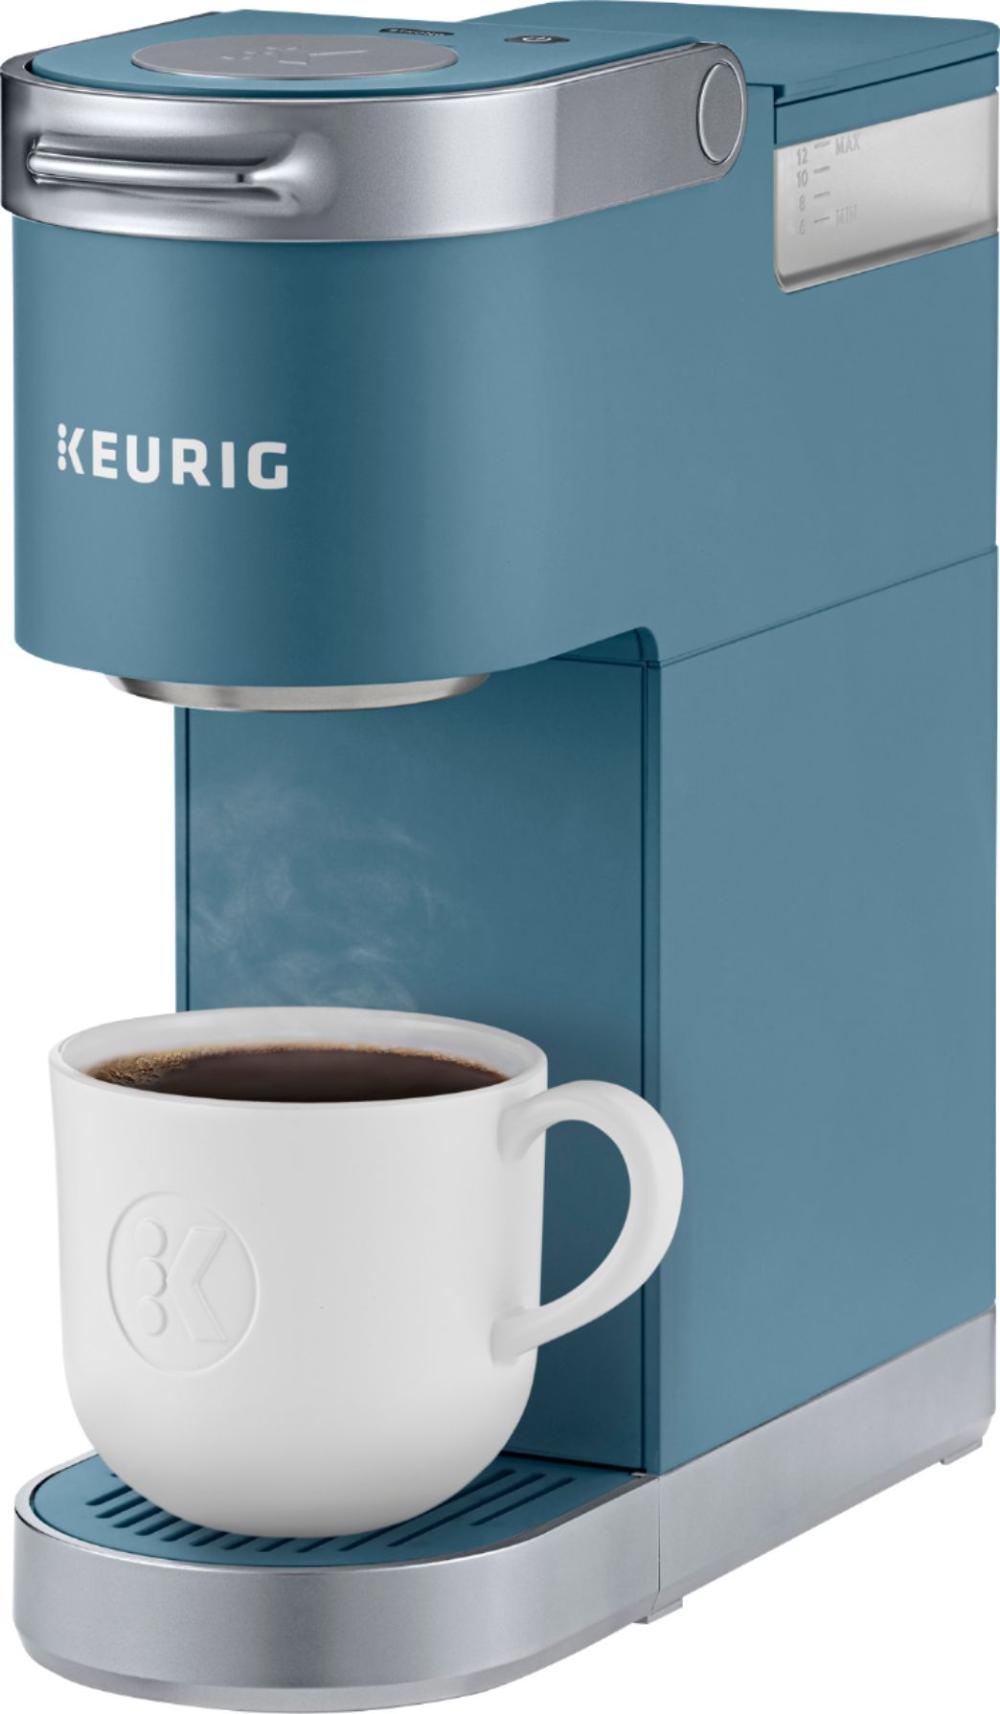 Keurig K Mini Plus Single Serve K Cup Pod Coffee Maker Evening Teal 5000203817 Best Buy In 2020 Pod Coffee Makers Keurig Single Serve Coffee Makers